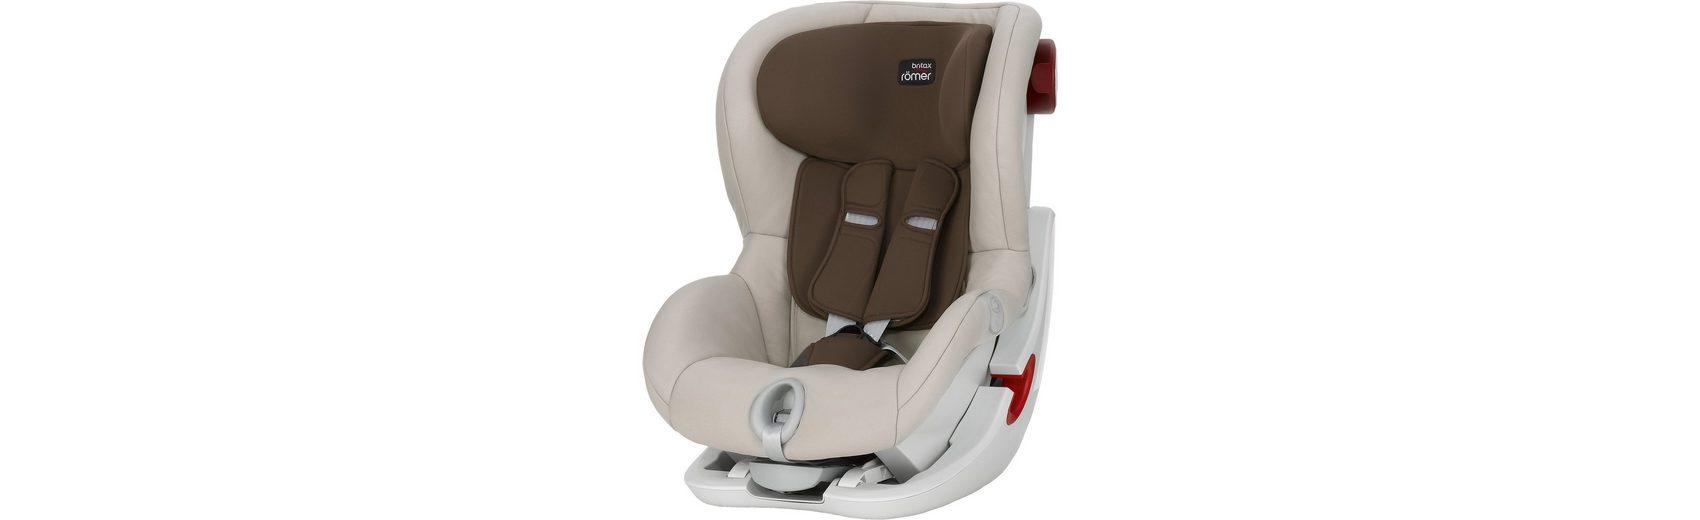 Britax Römer Auto-Kindersitz King II, Sand Beige, 2016